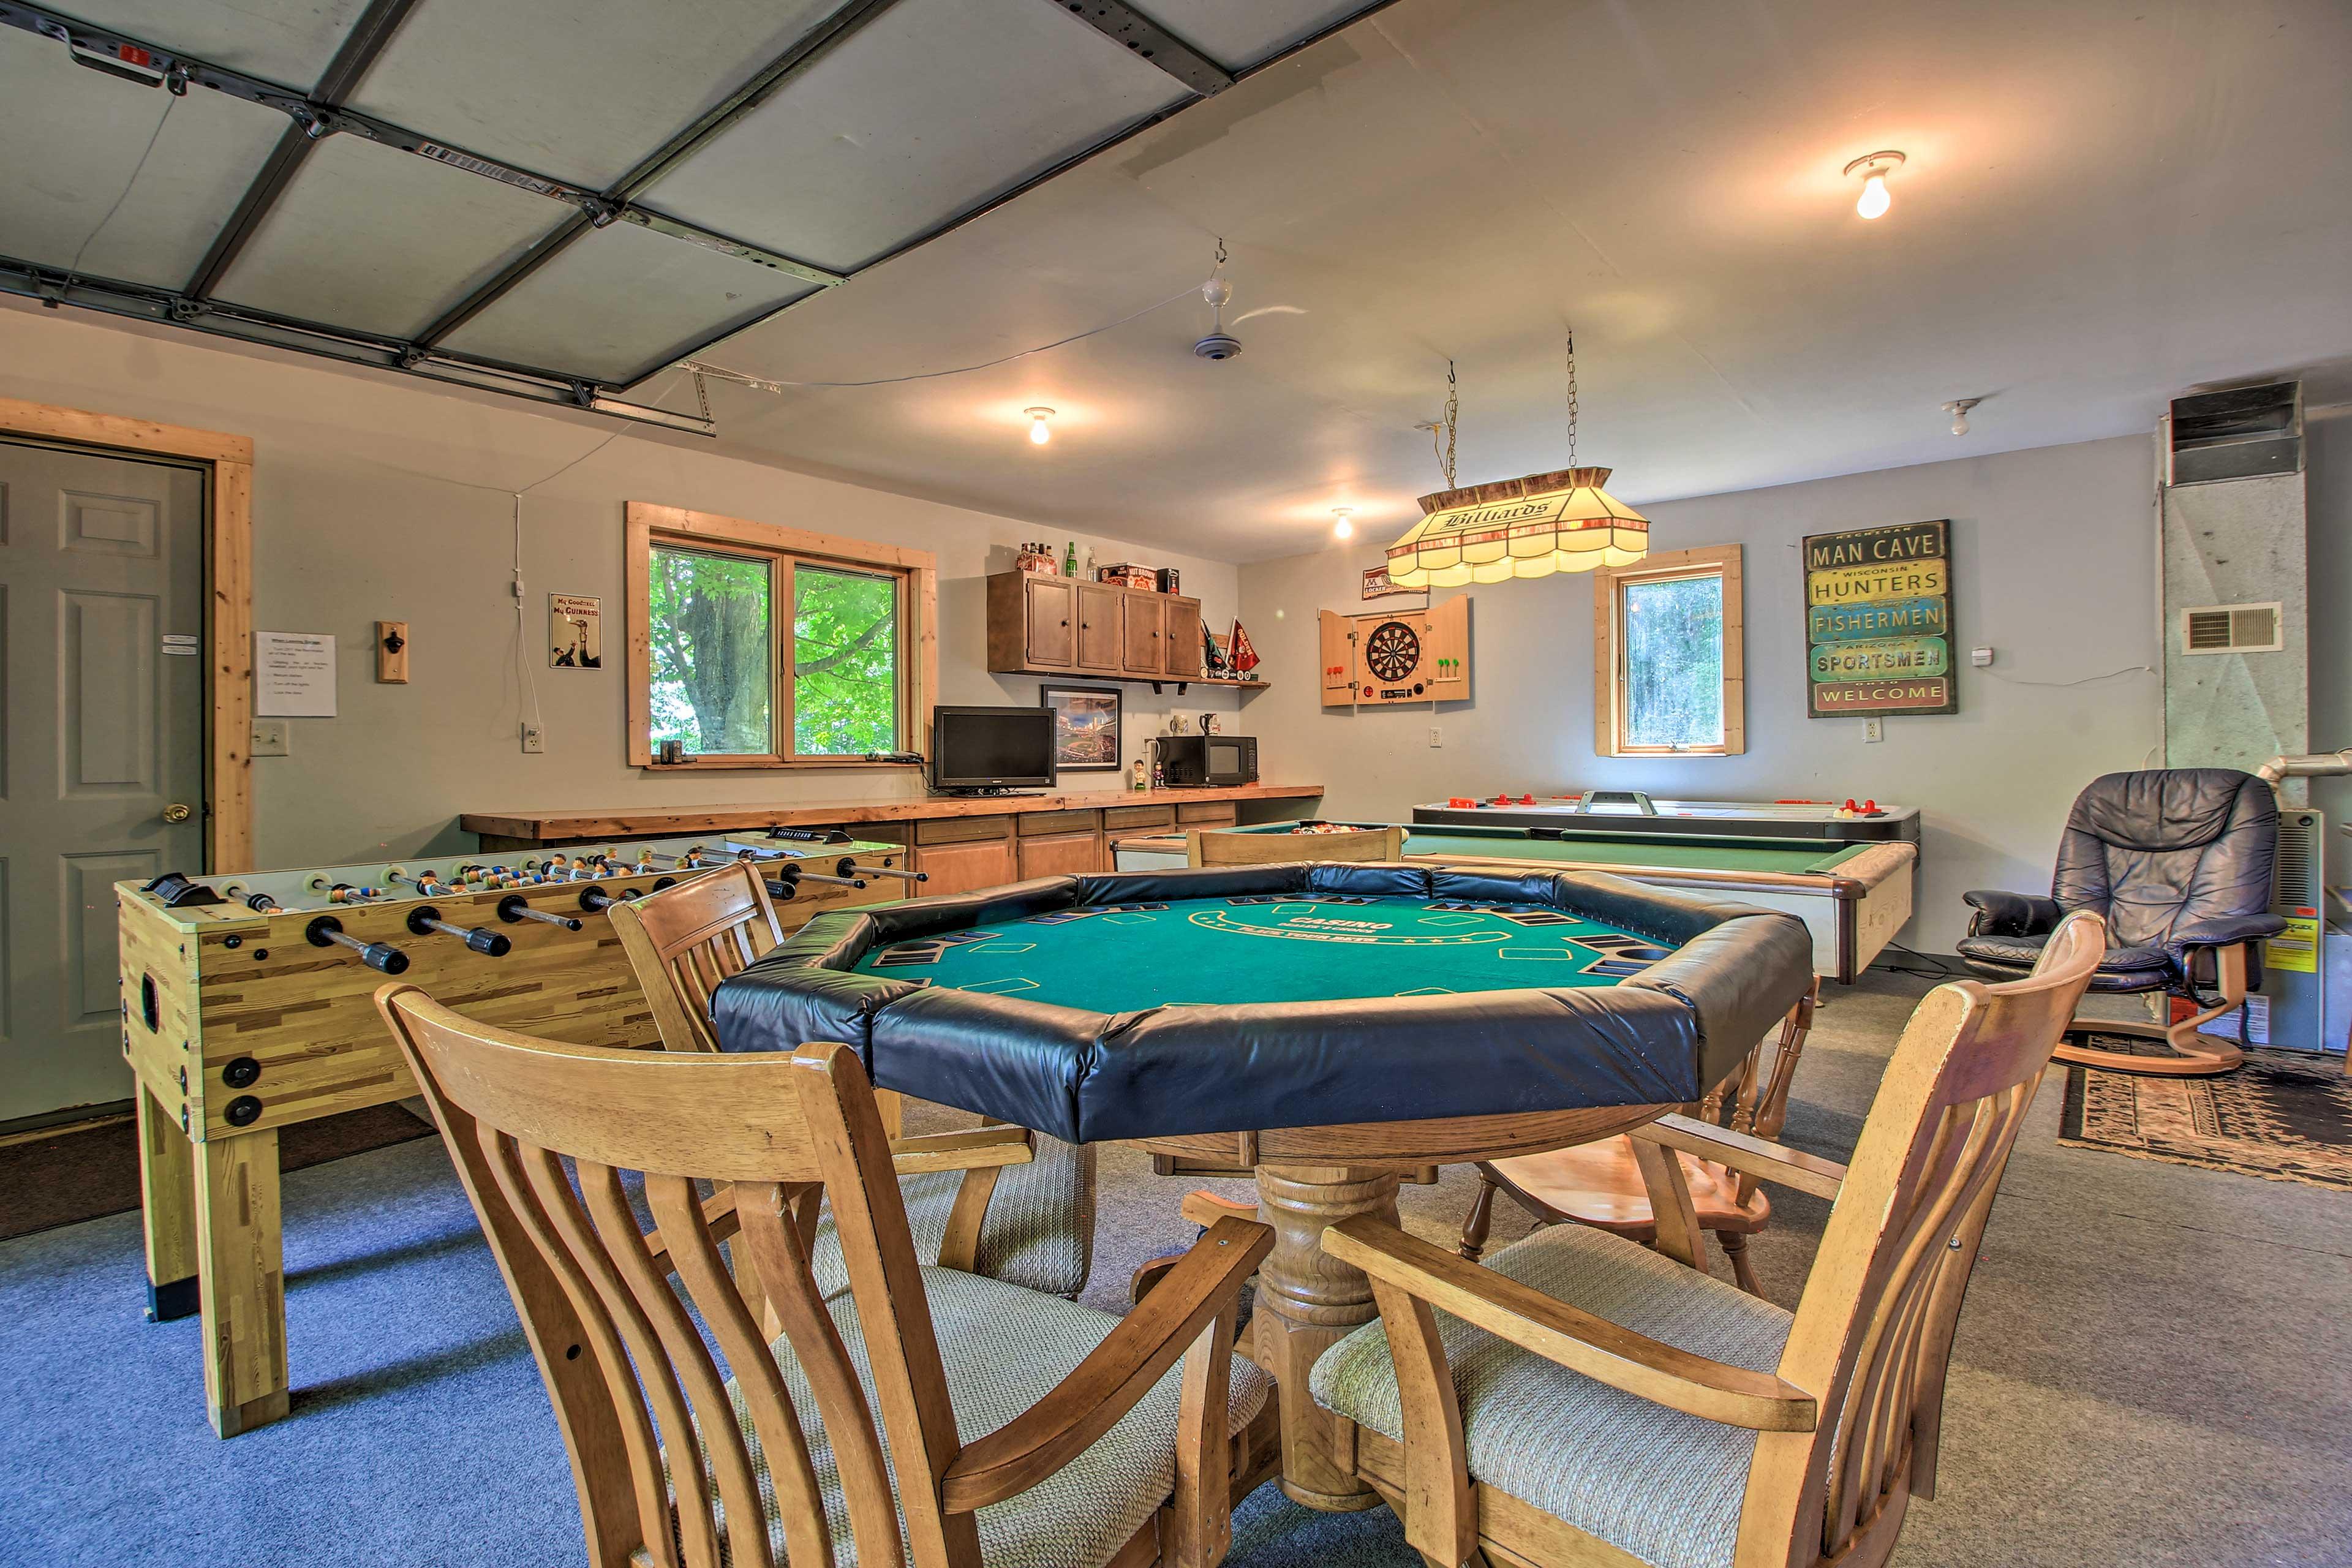 Play some poker, foosball, air hockey, ski ball, or pool.